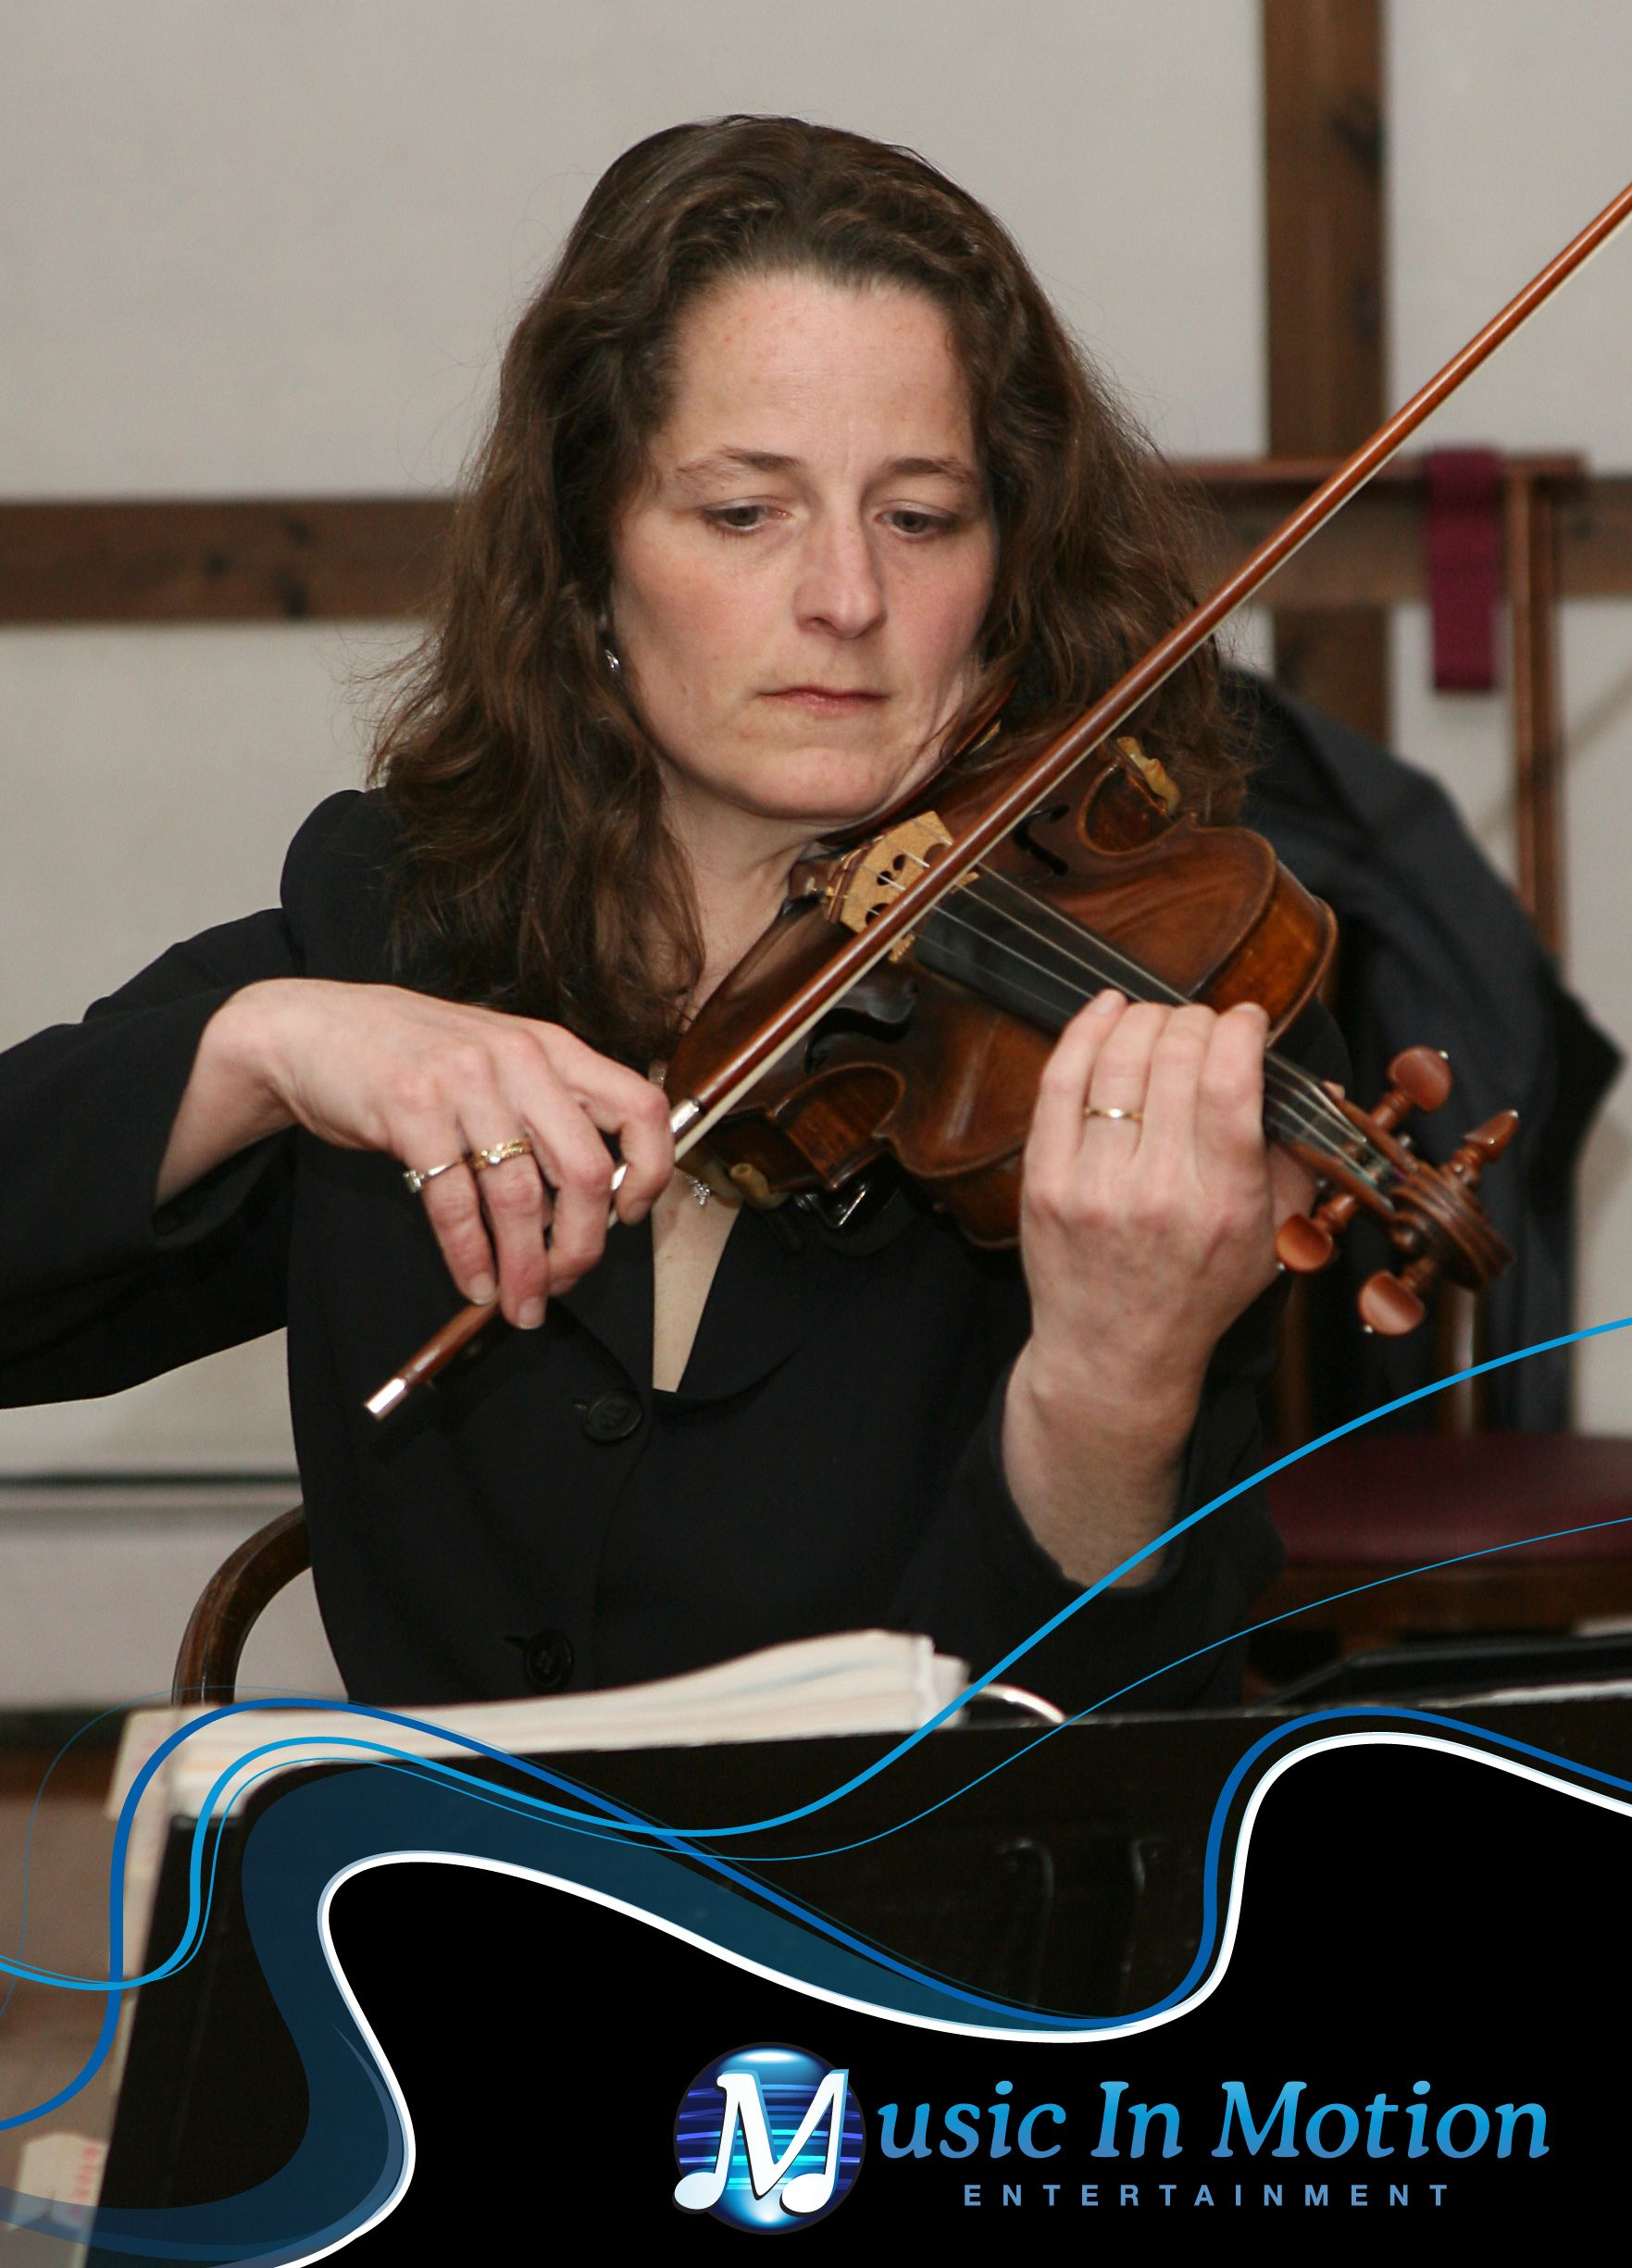 Virtuoso Violinist Jennifer Casey Of Music In Motion